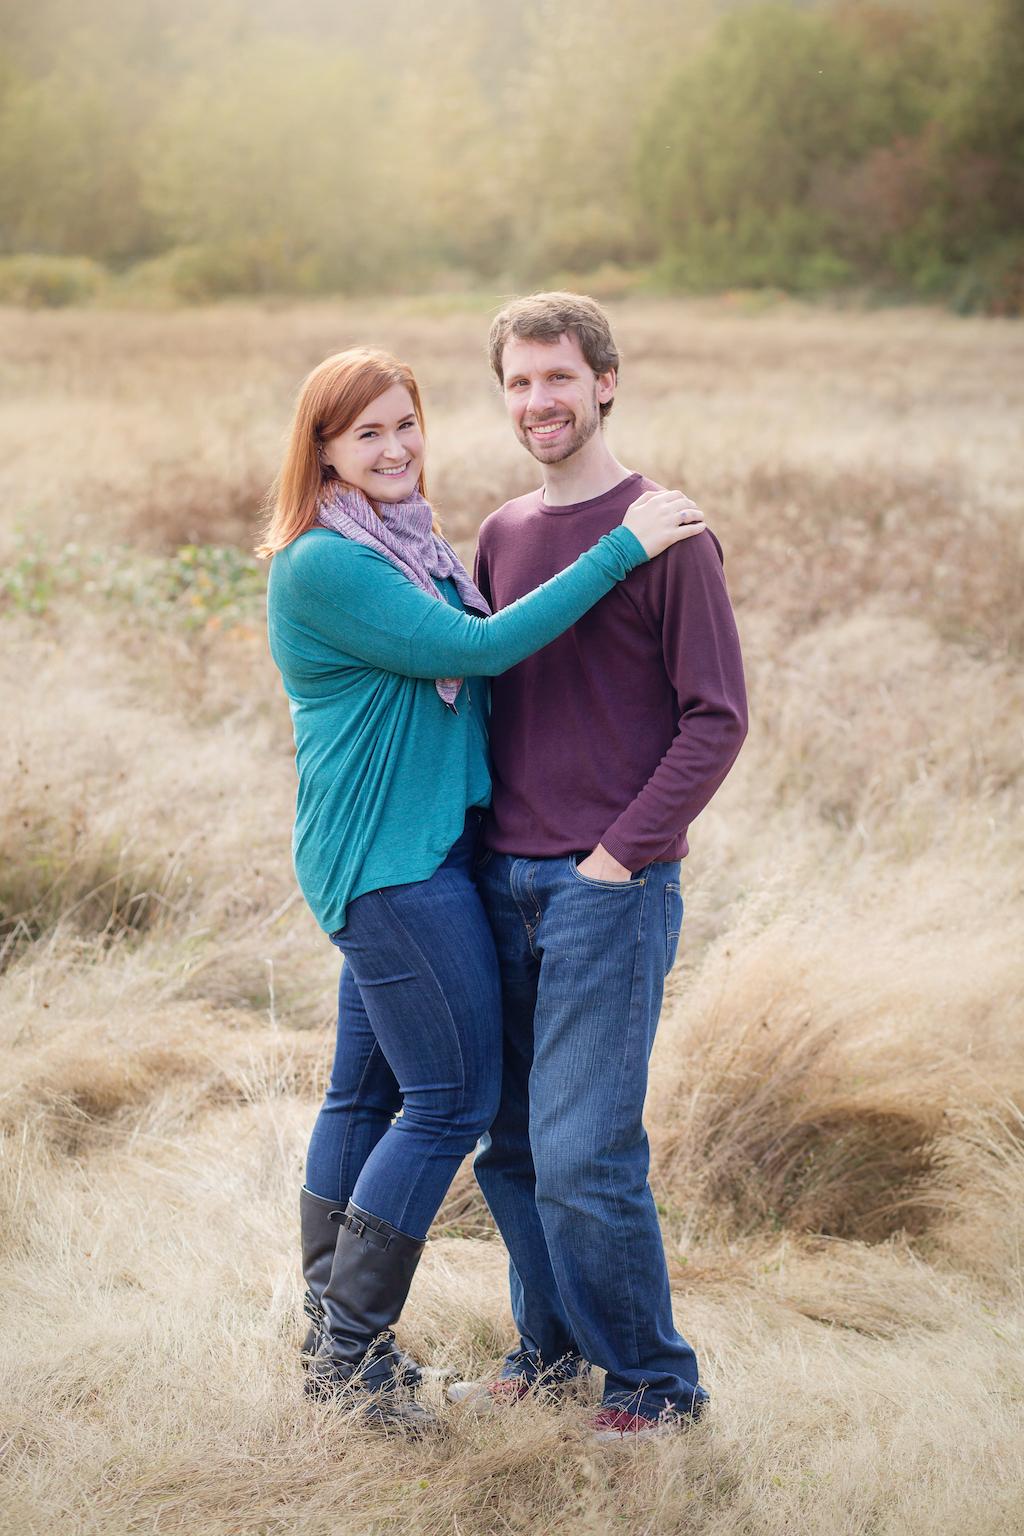 kate-and-jon-fall-couples-photoshoot